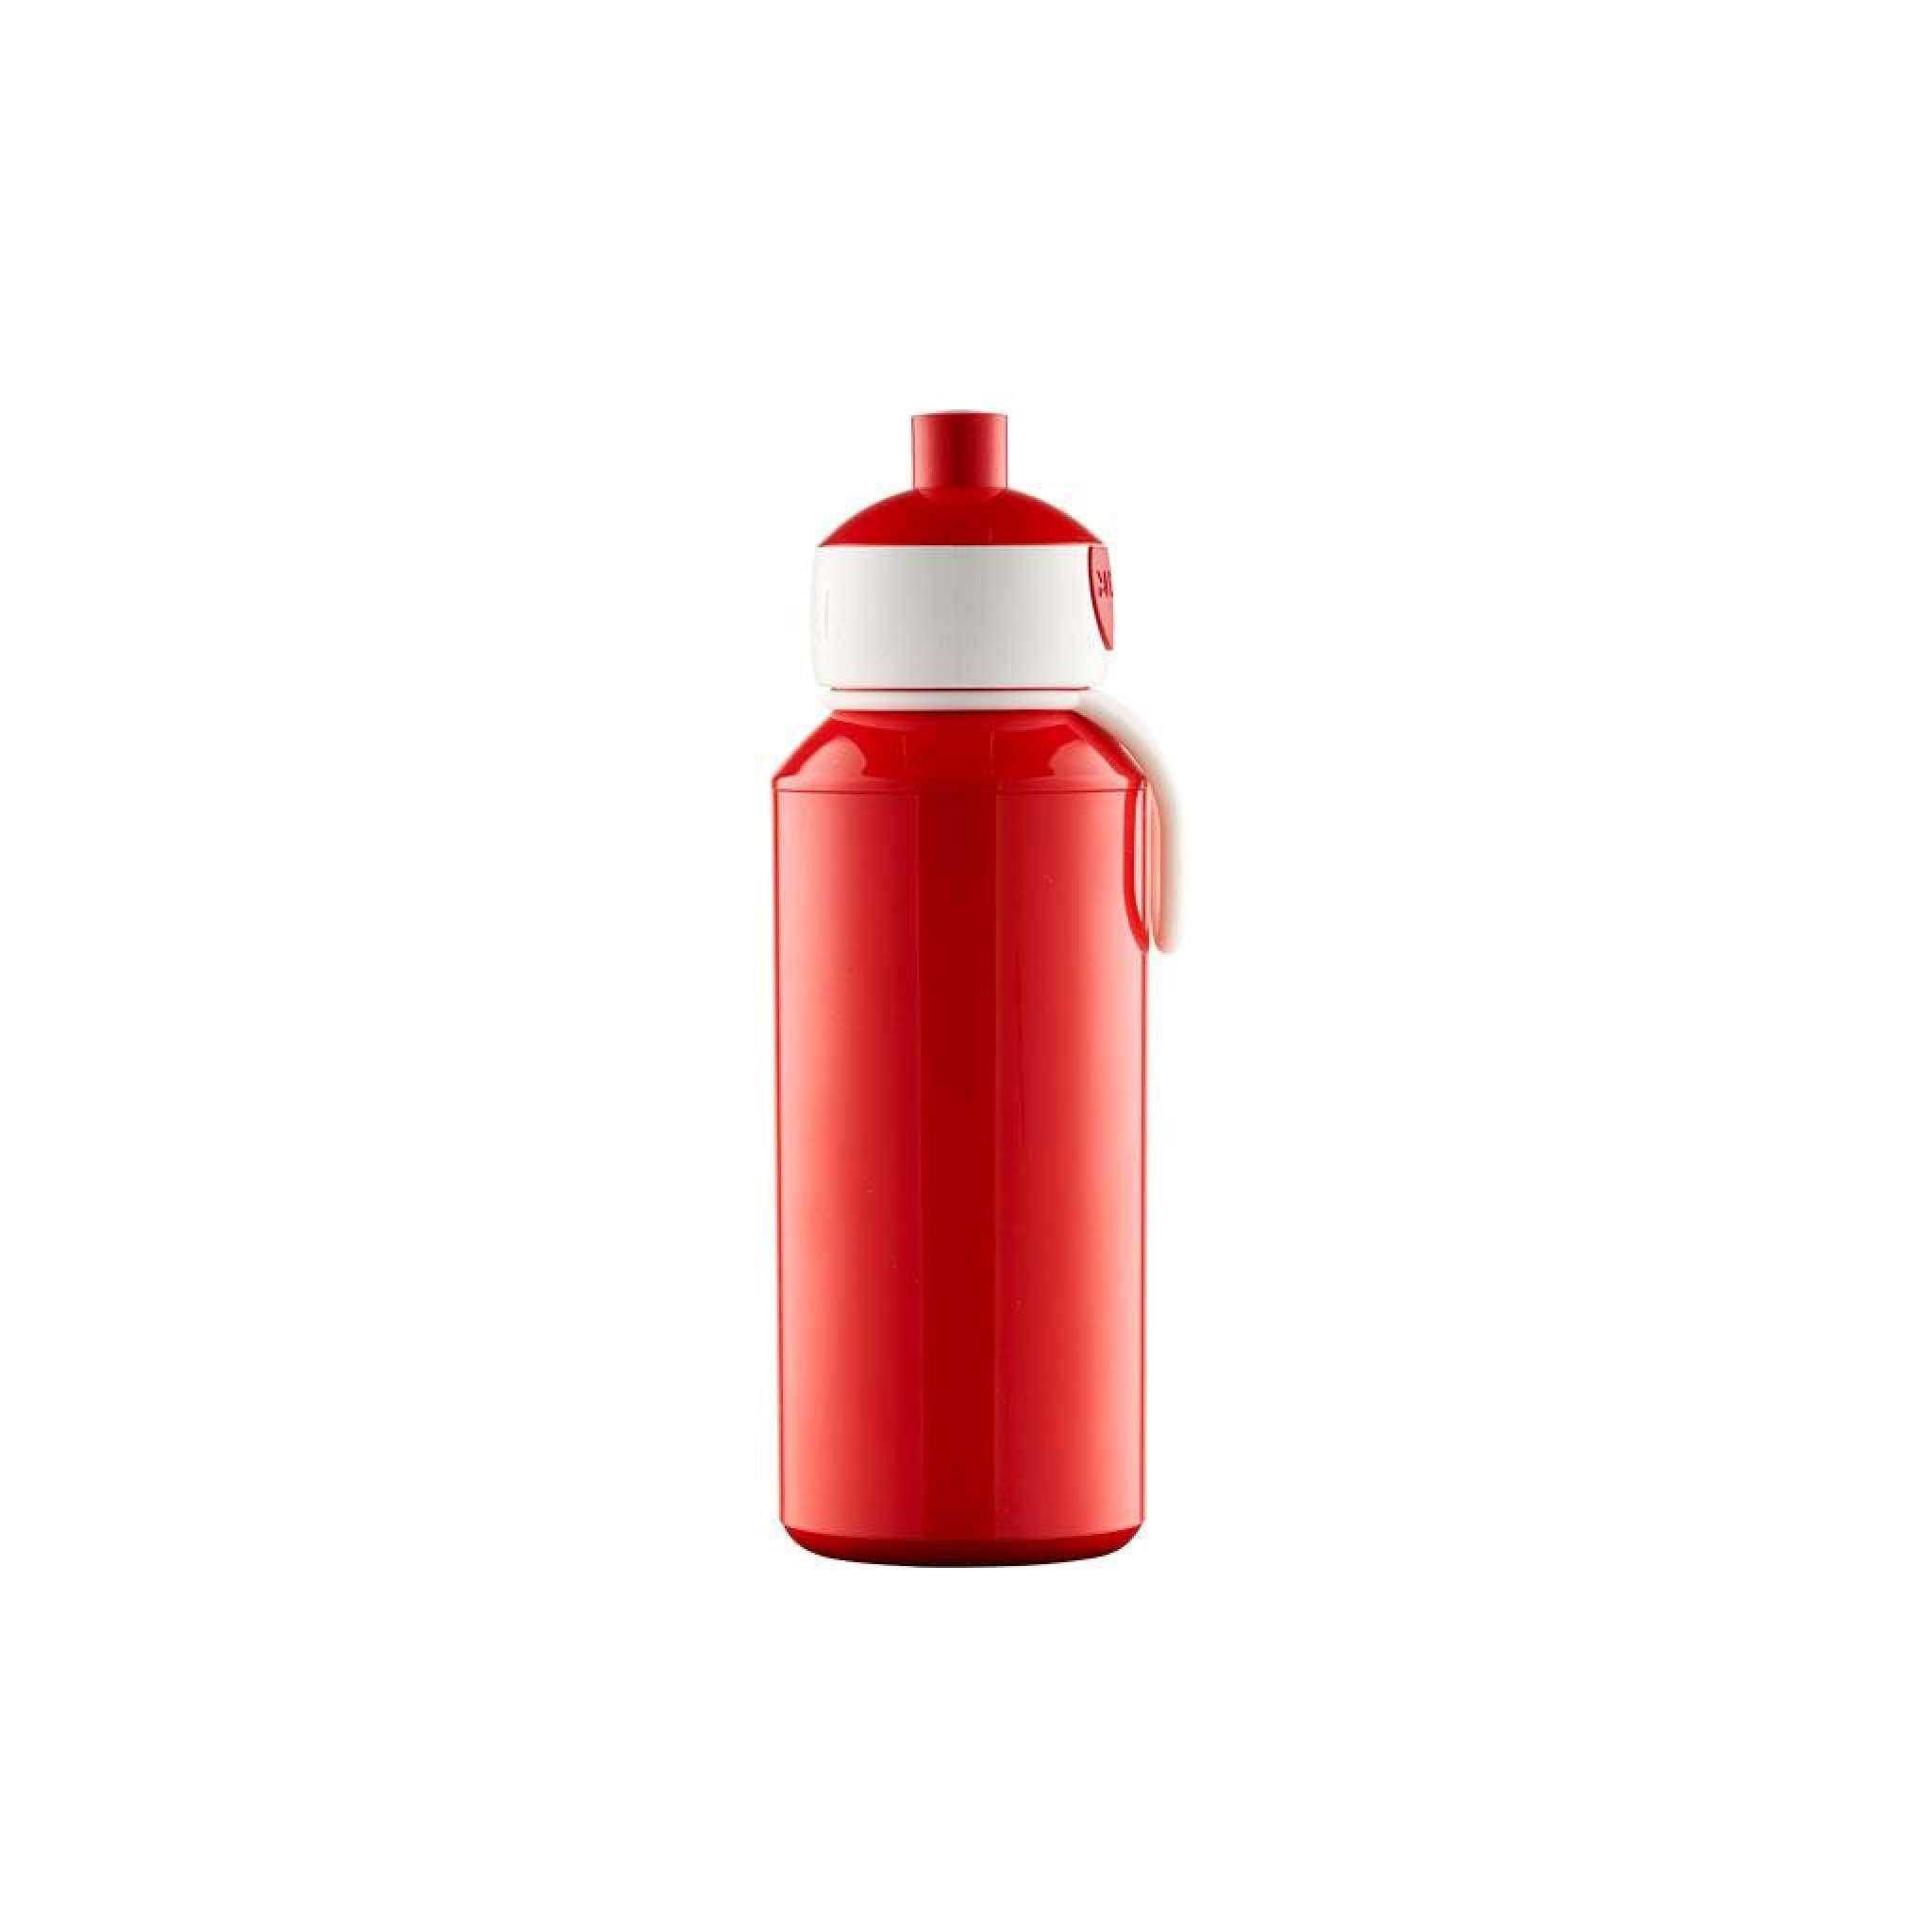 Mepal Drikkeflaske 400 ml rød